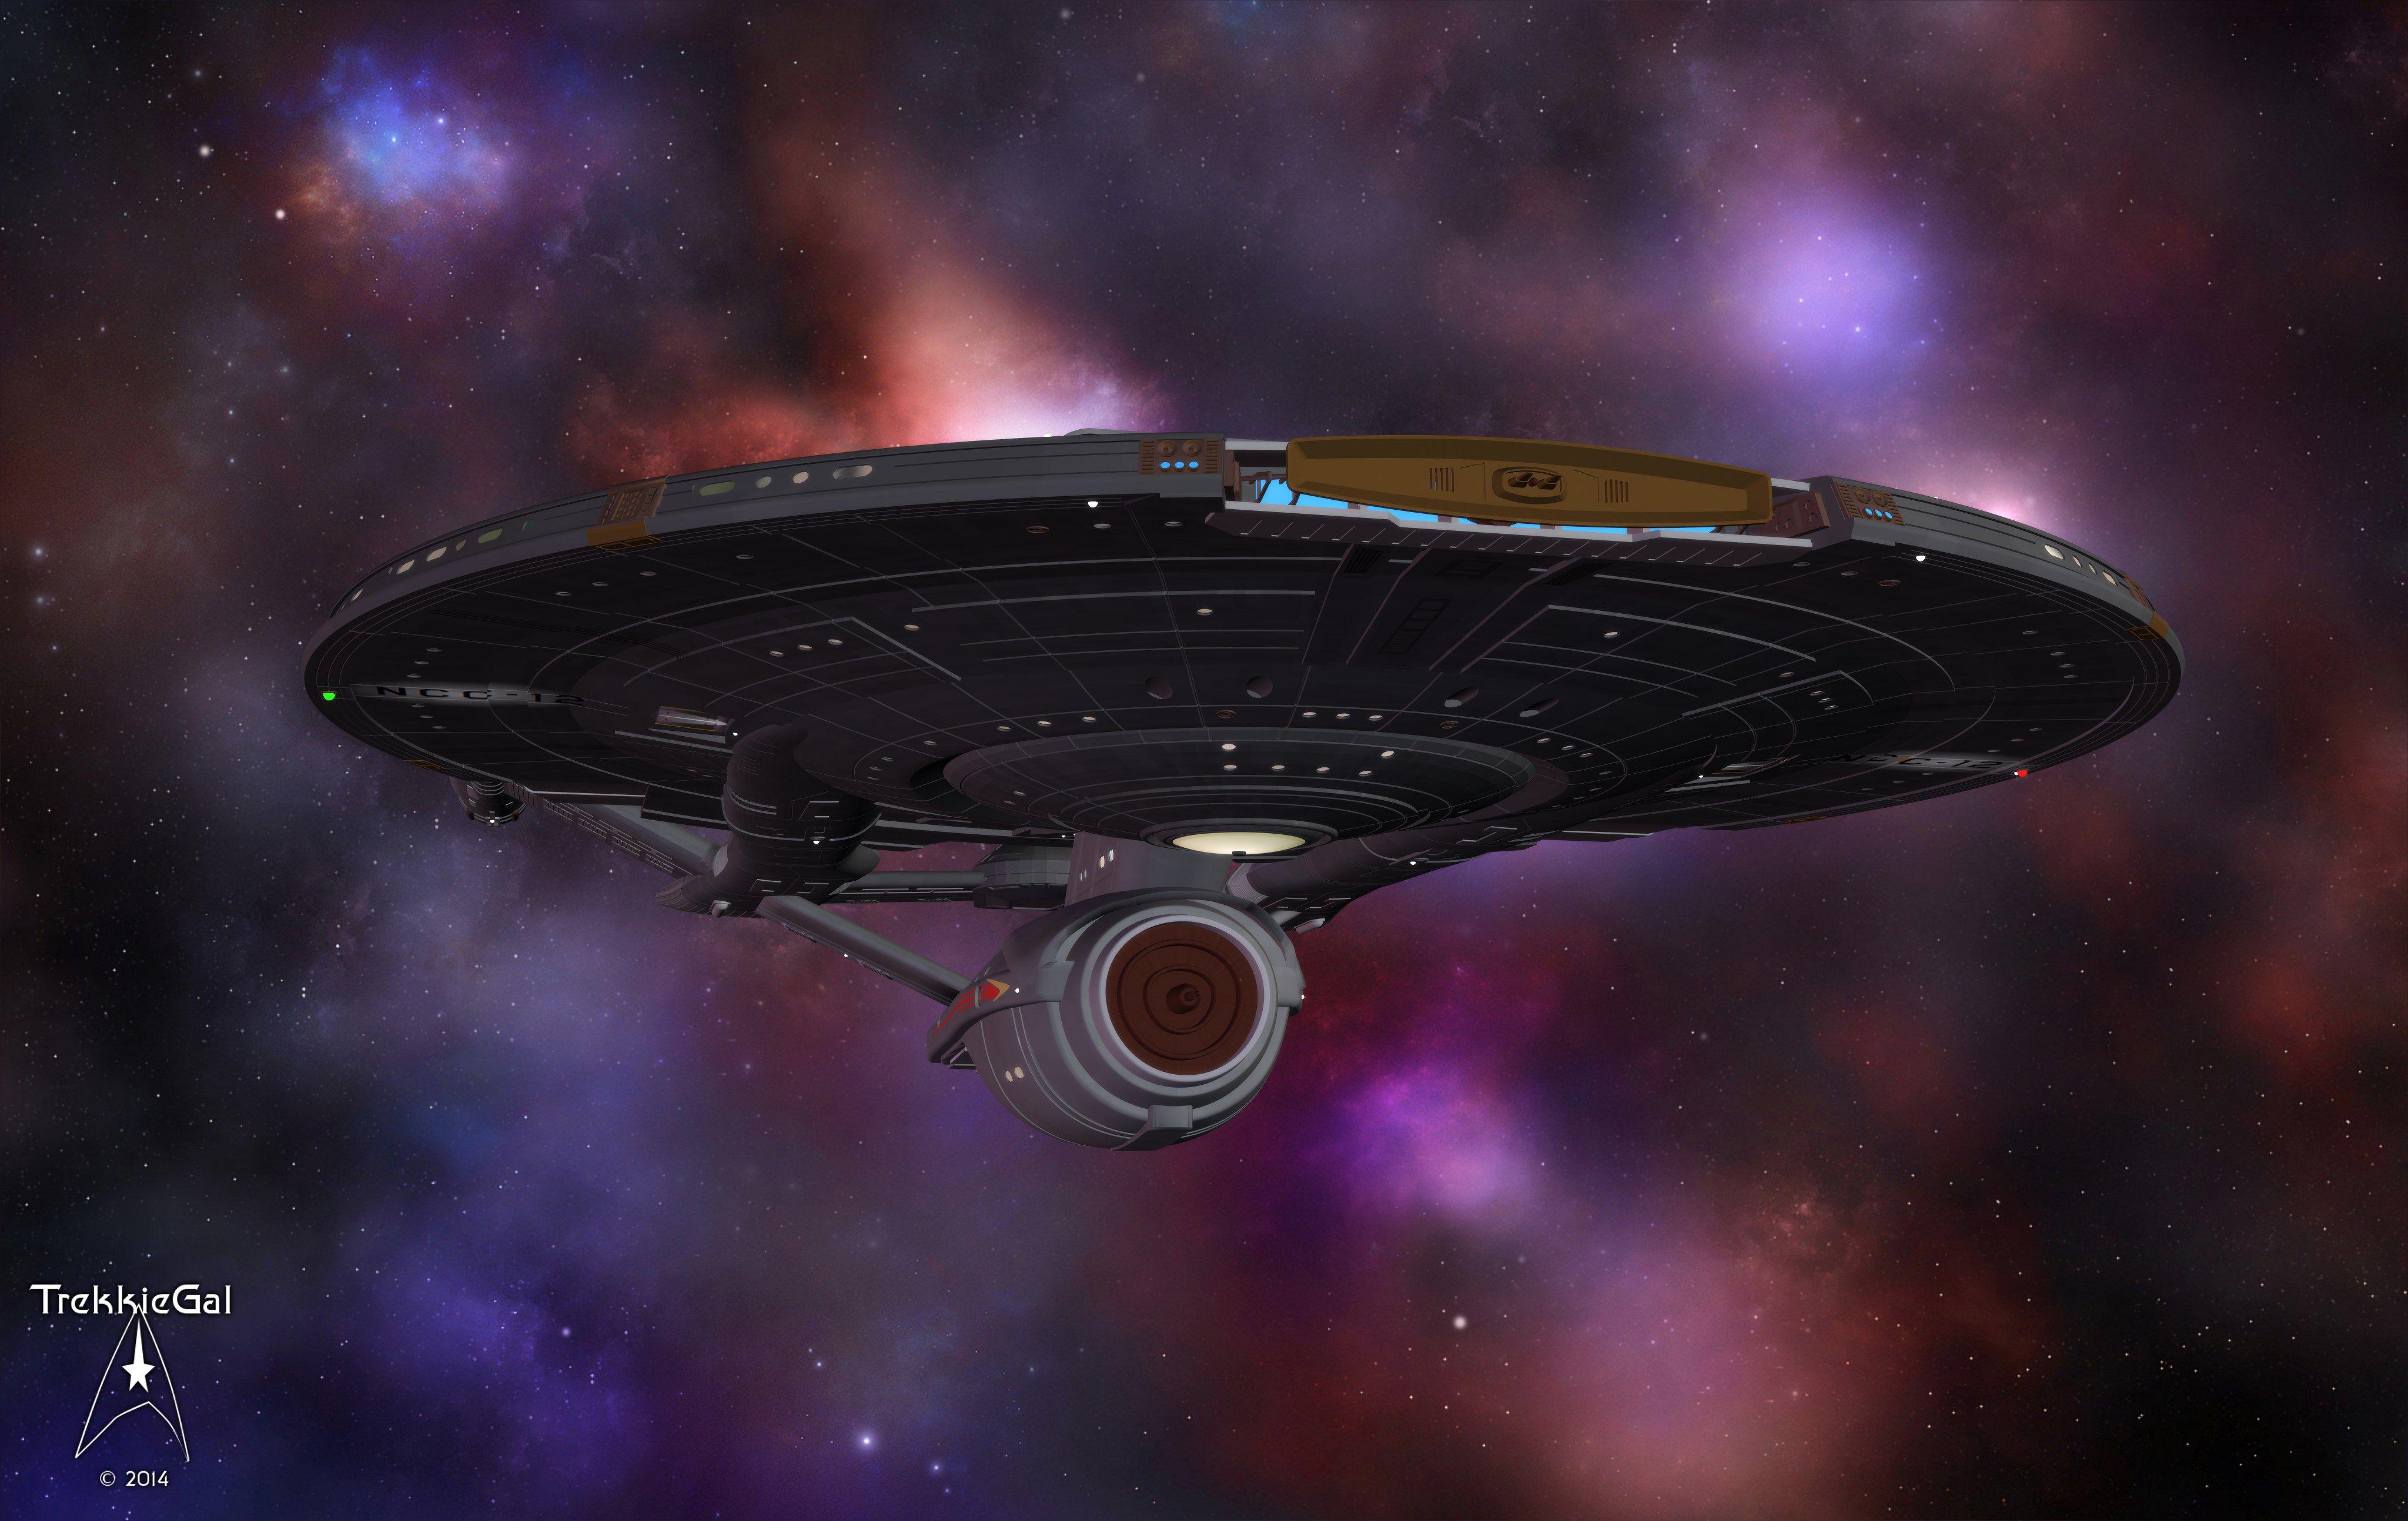 Star Trek Free Hd Widescreen Star Trek Trek Uss Enterprise